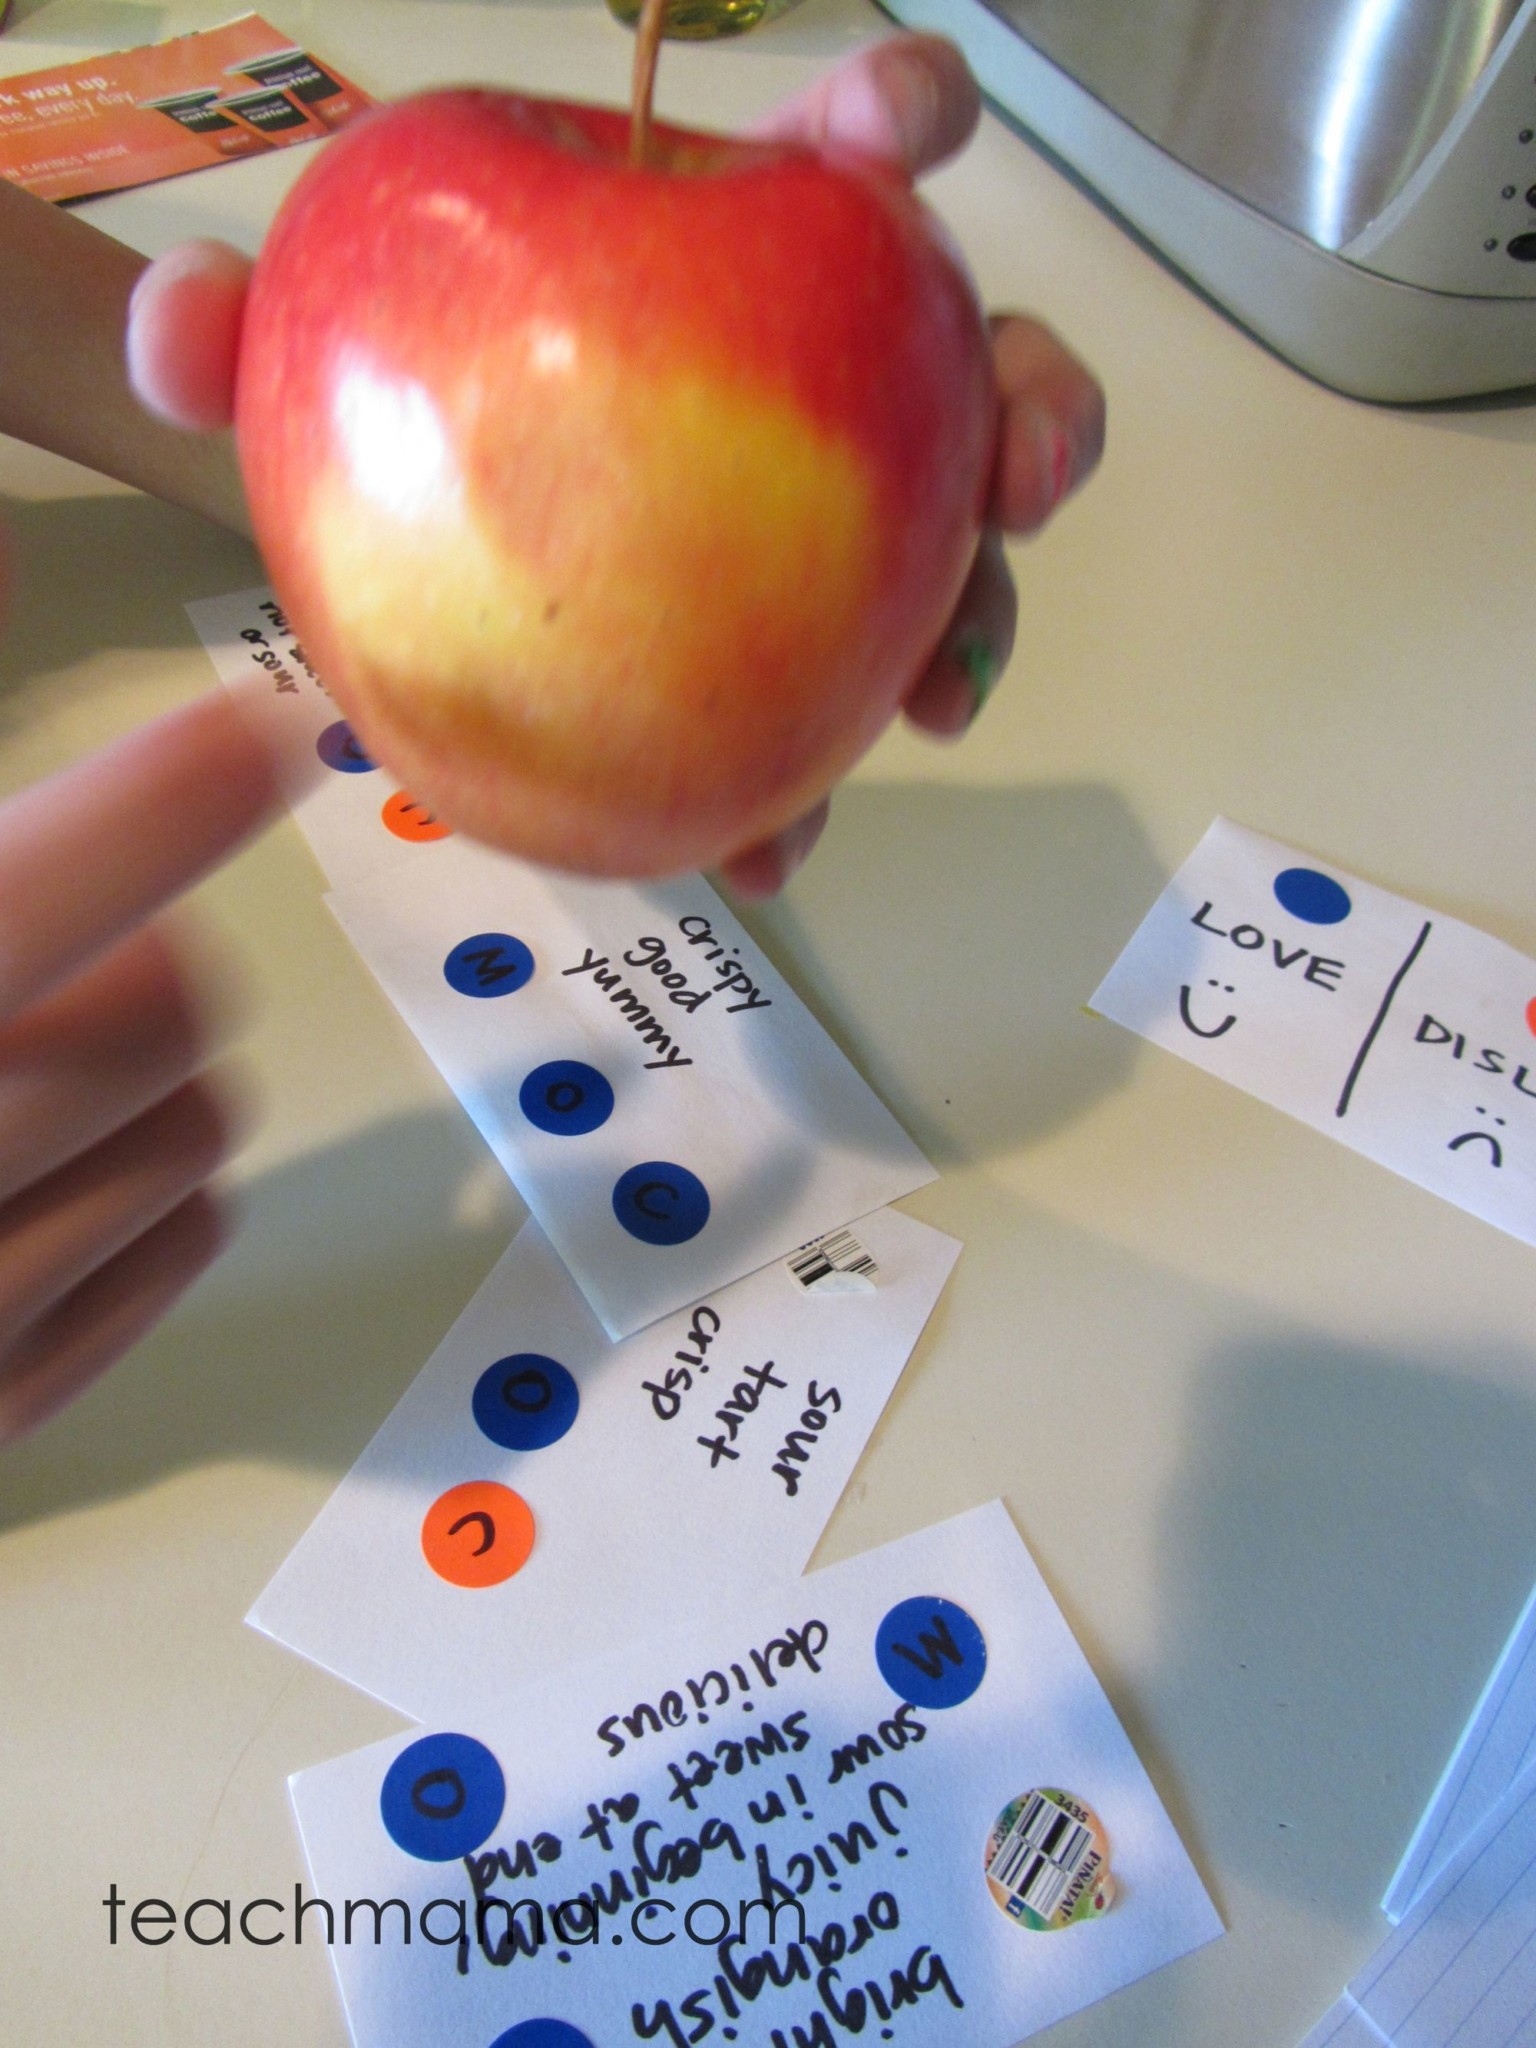 red apple taste test   science at home   teachmama.com